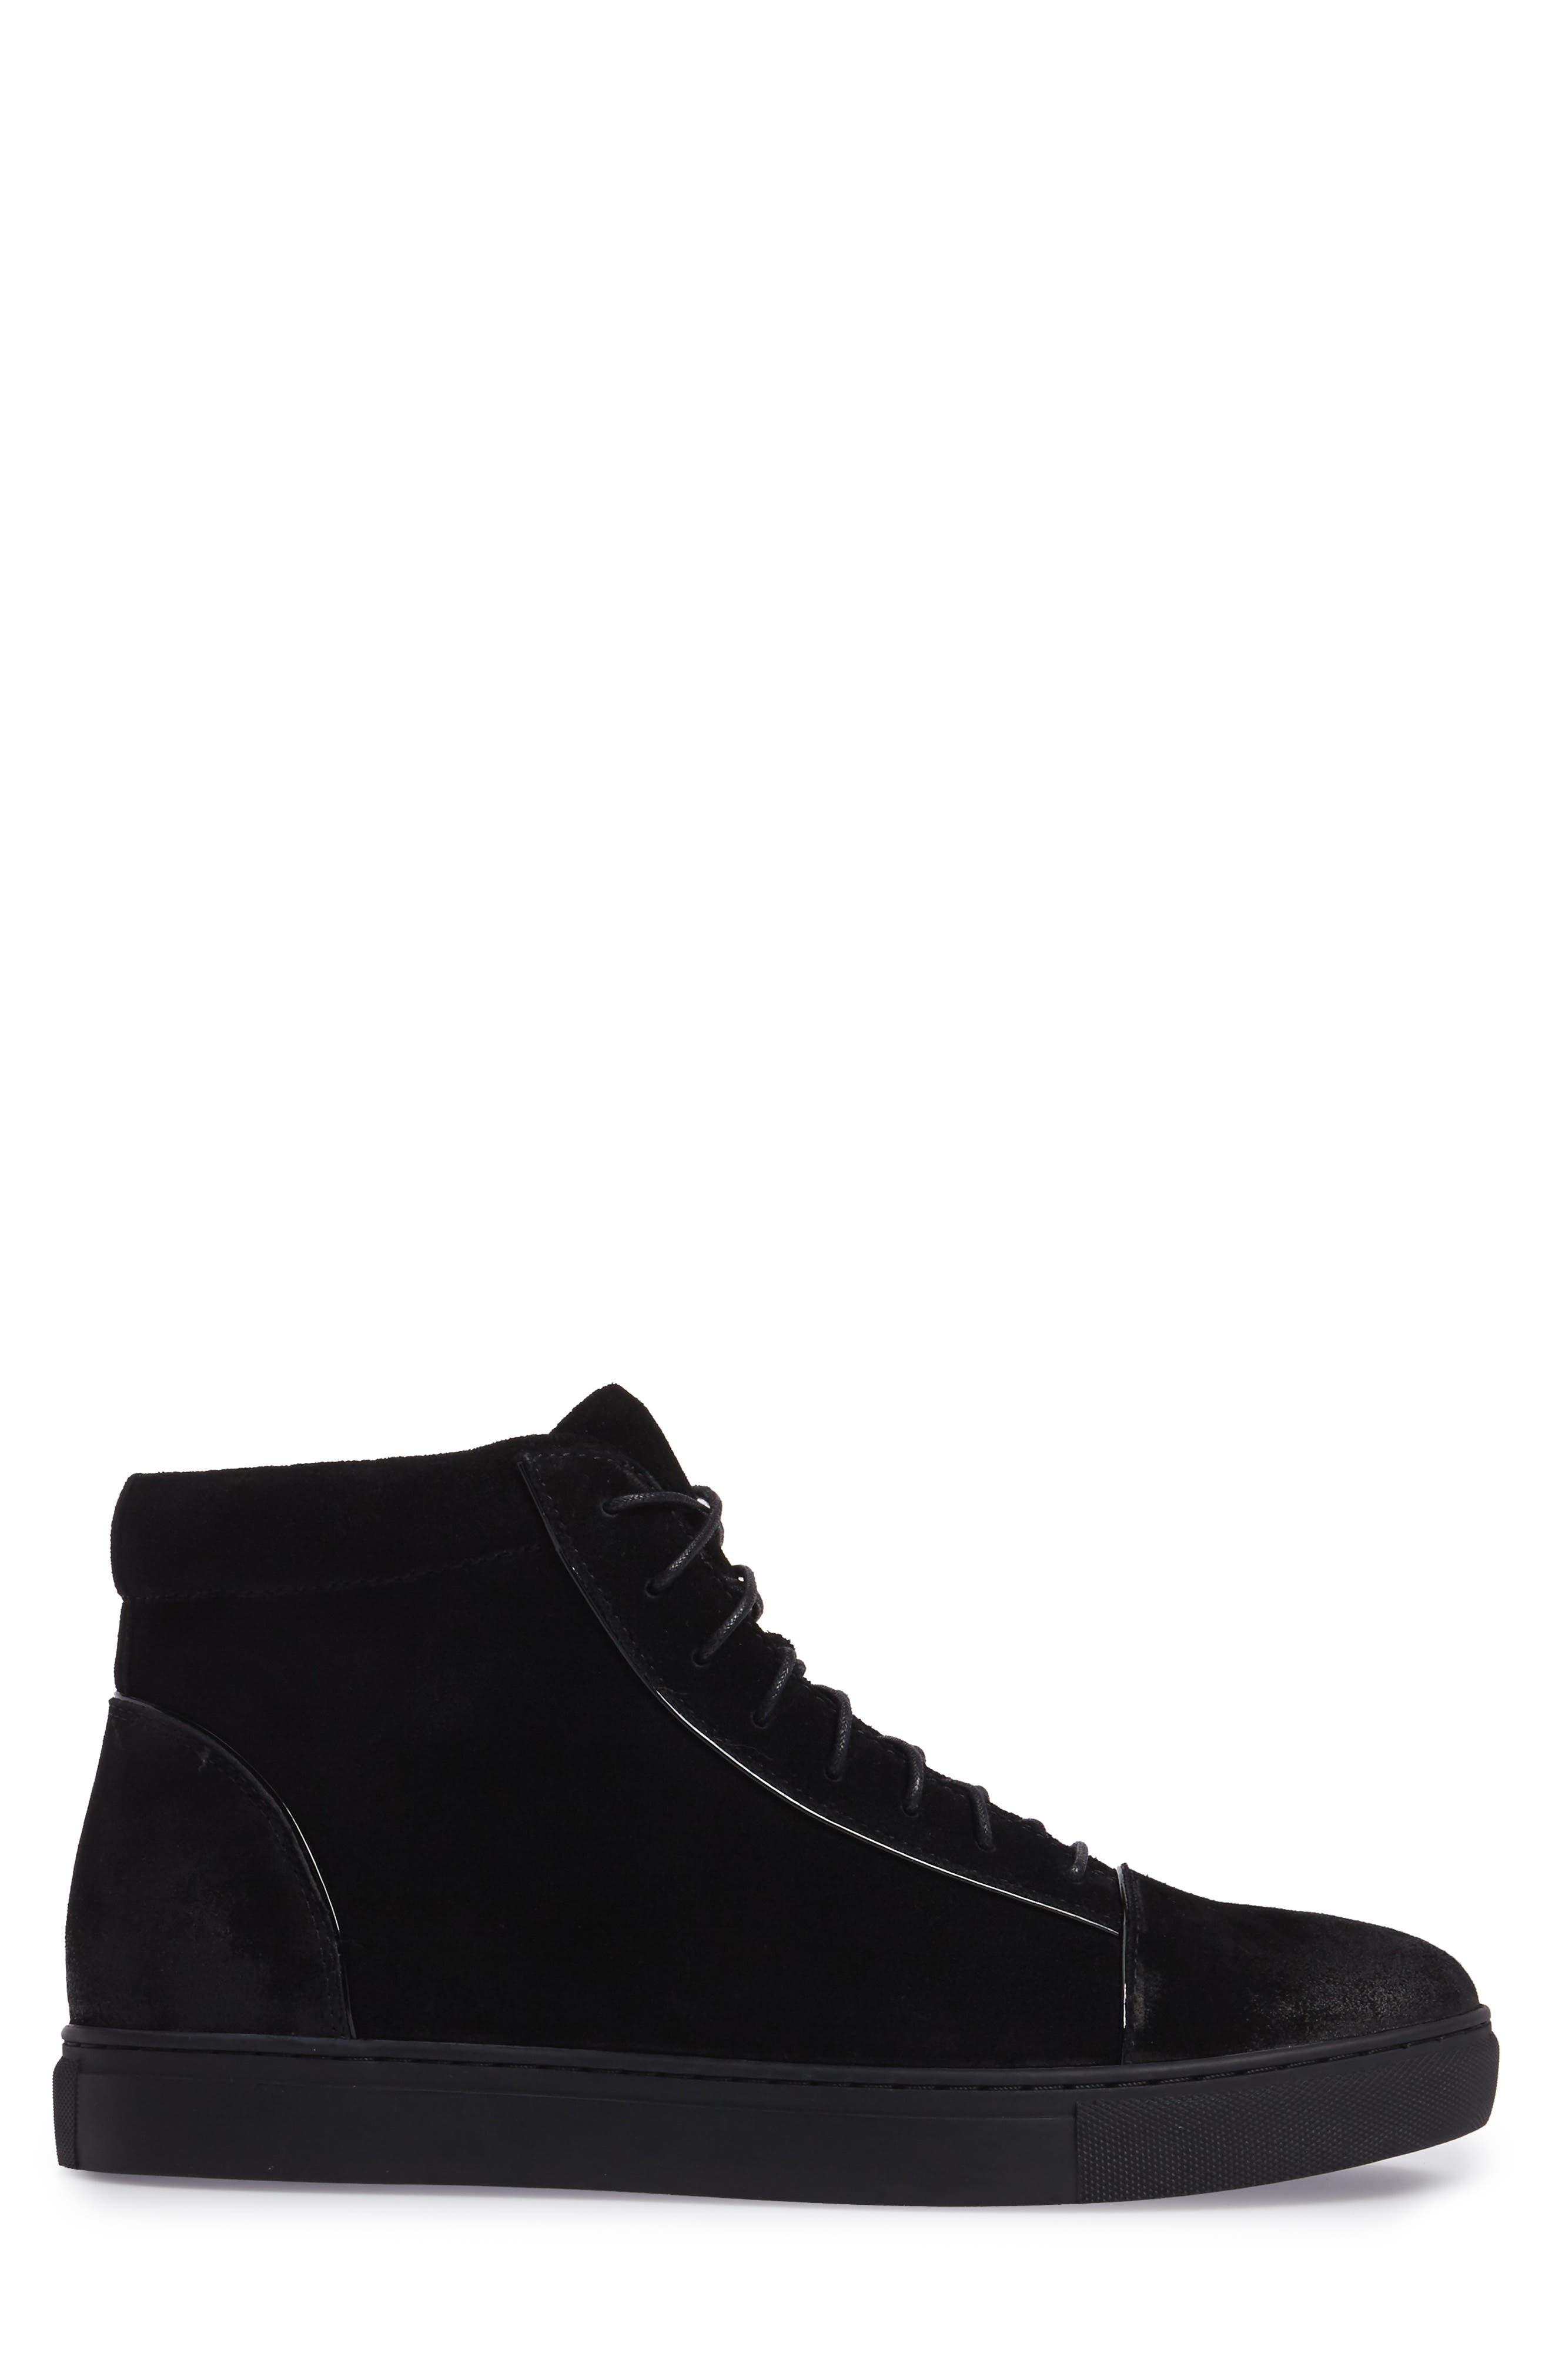 Grundy Sneaker,                             Alternate thumbnail 3, color,                             Black Suede